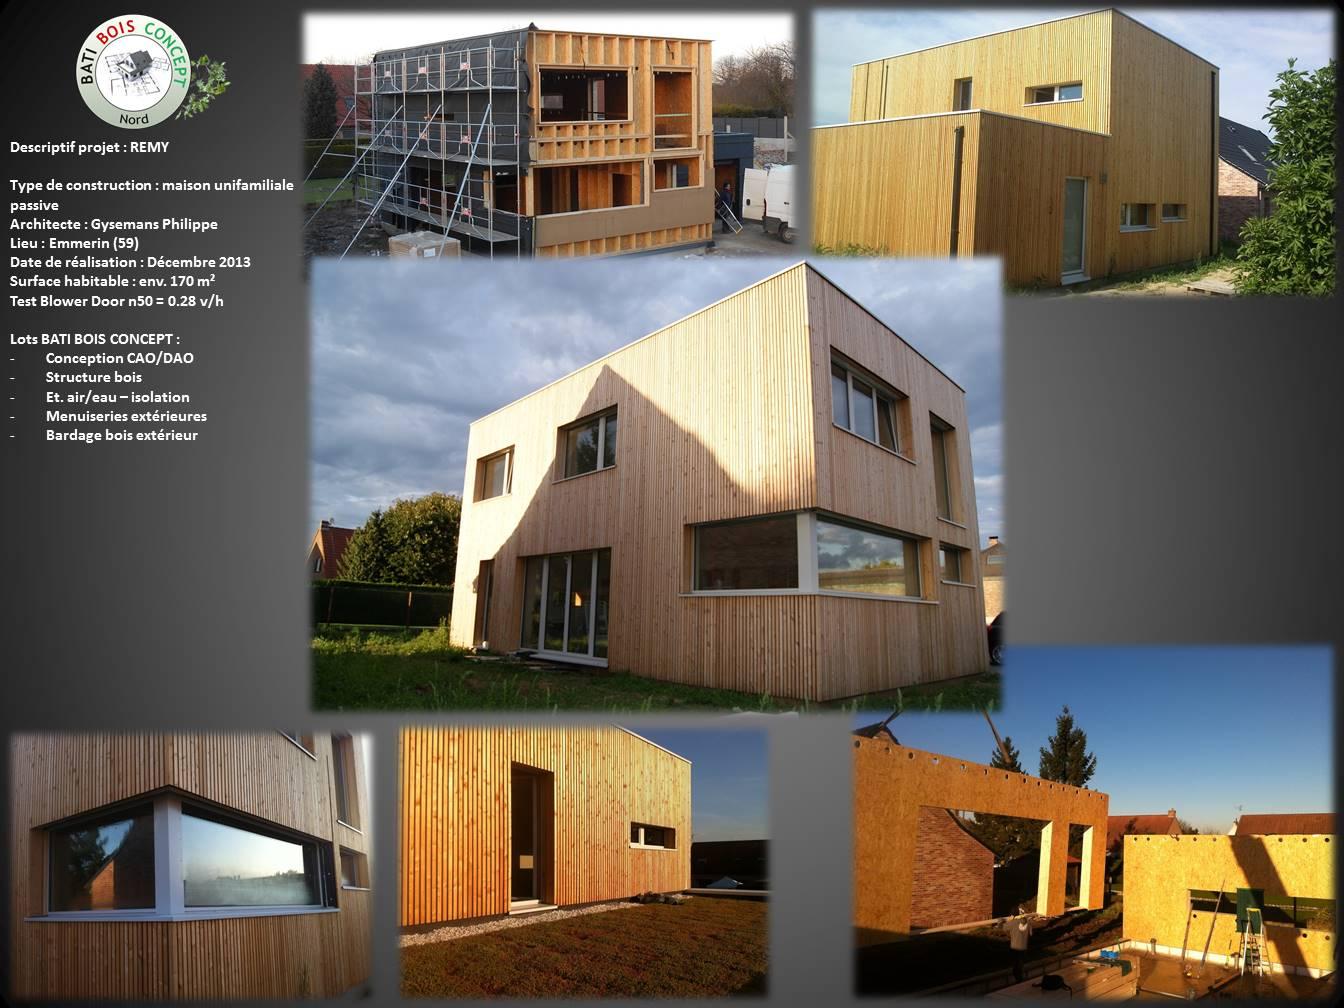 Maison passive nord 59 emmerin bati bois concept nord for Architecte maison passive